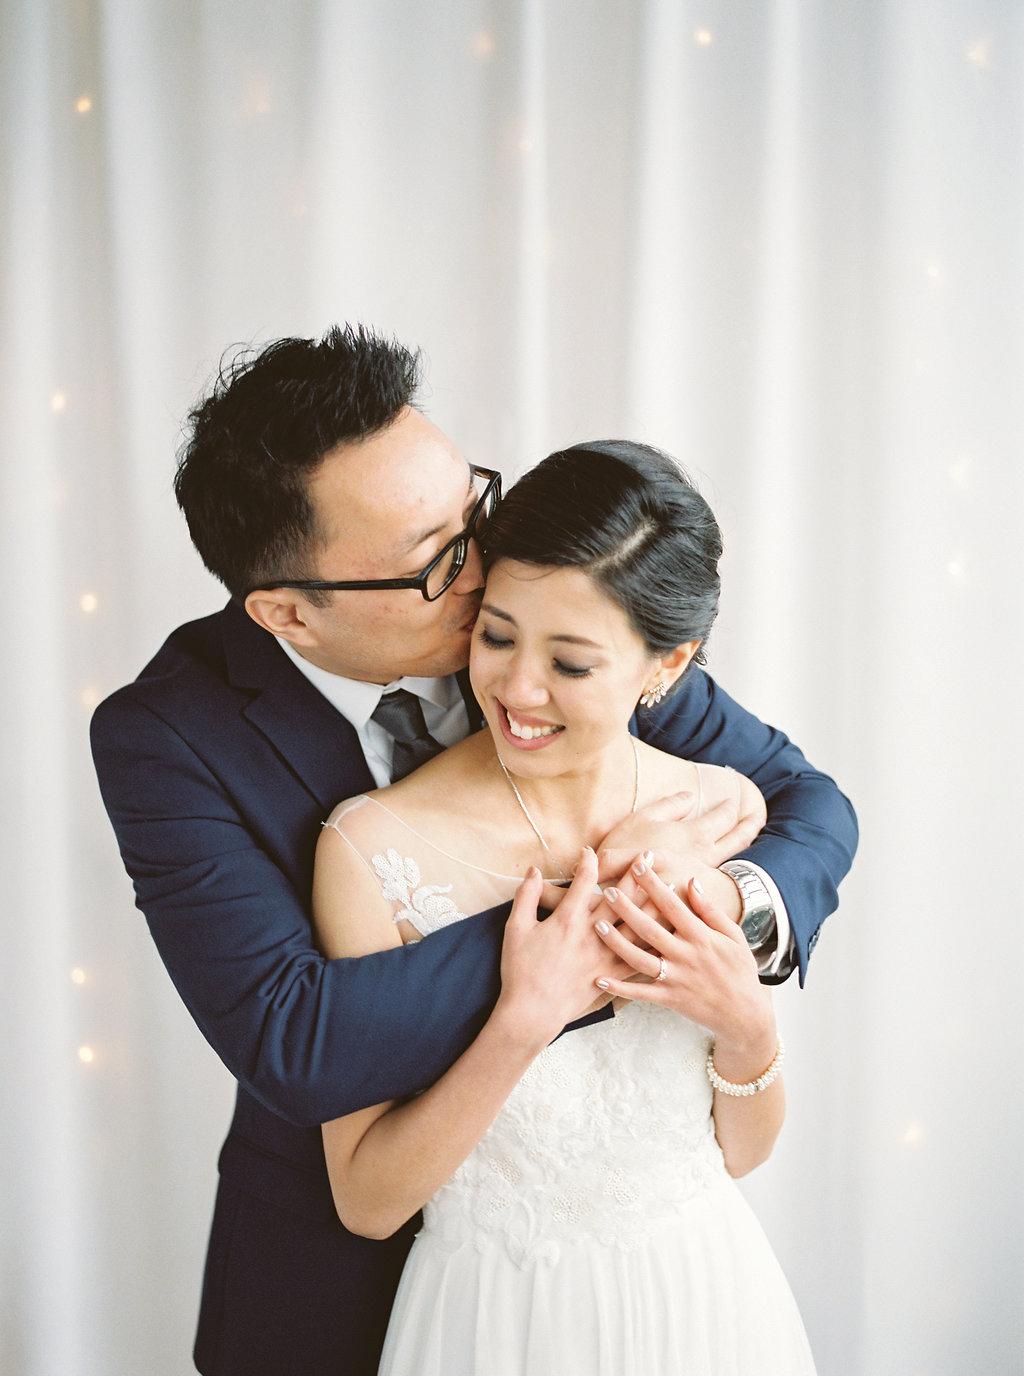 TM_Wedding_671.jpg